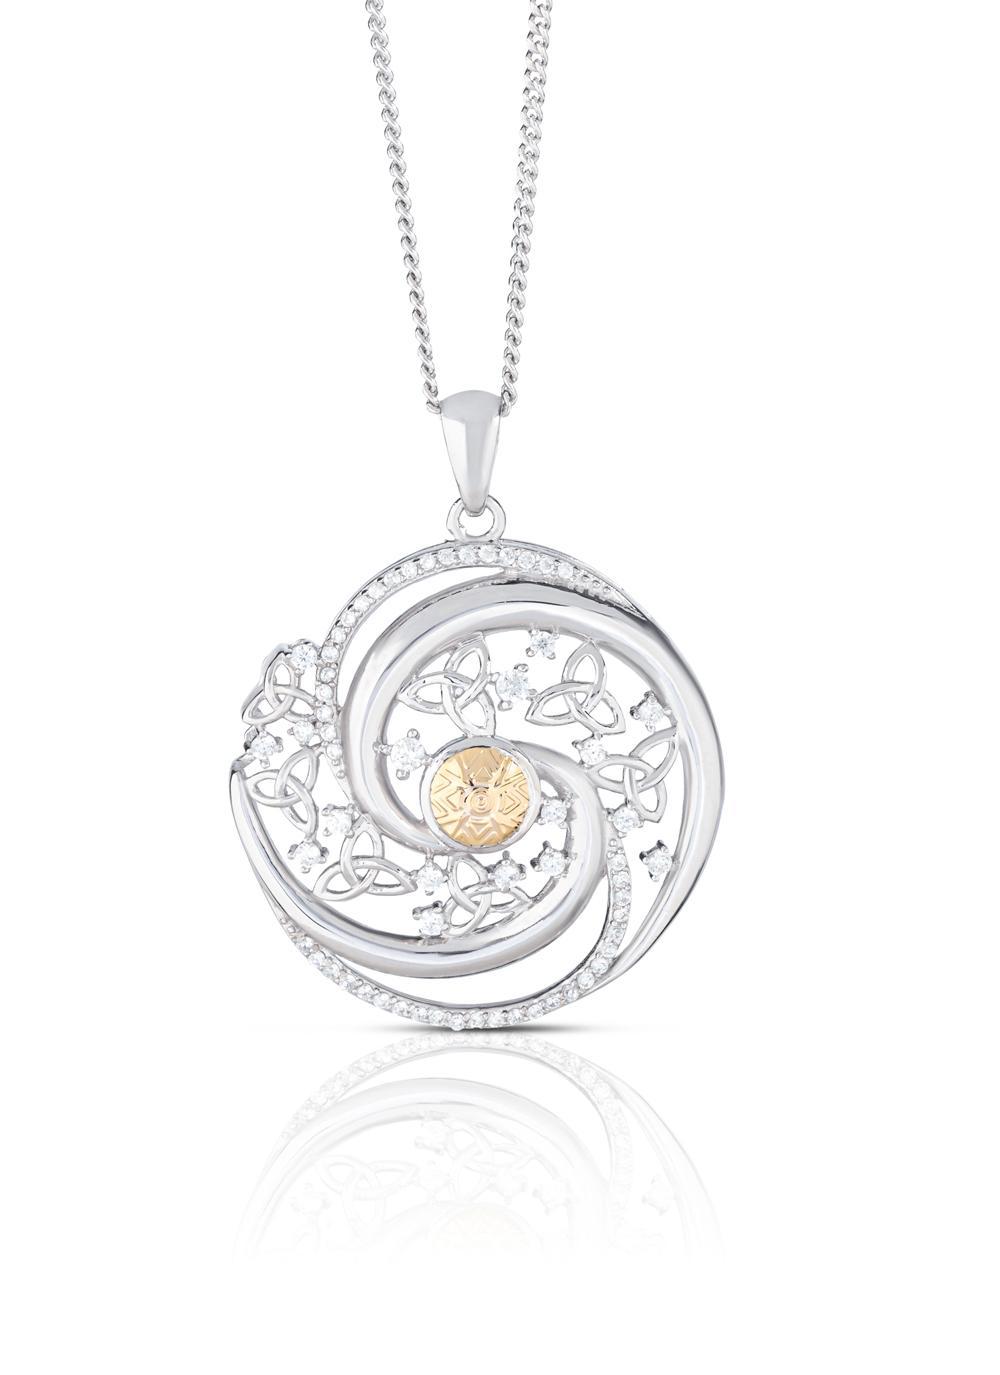 Sterling Silver & 18K Gold Bead Solstice Swirl Pendant